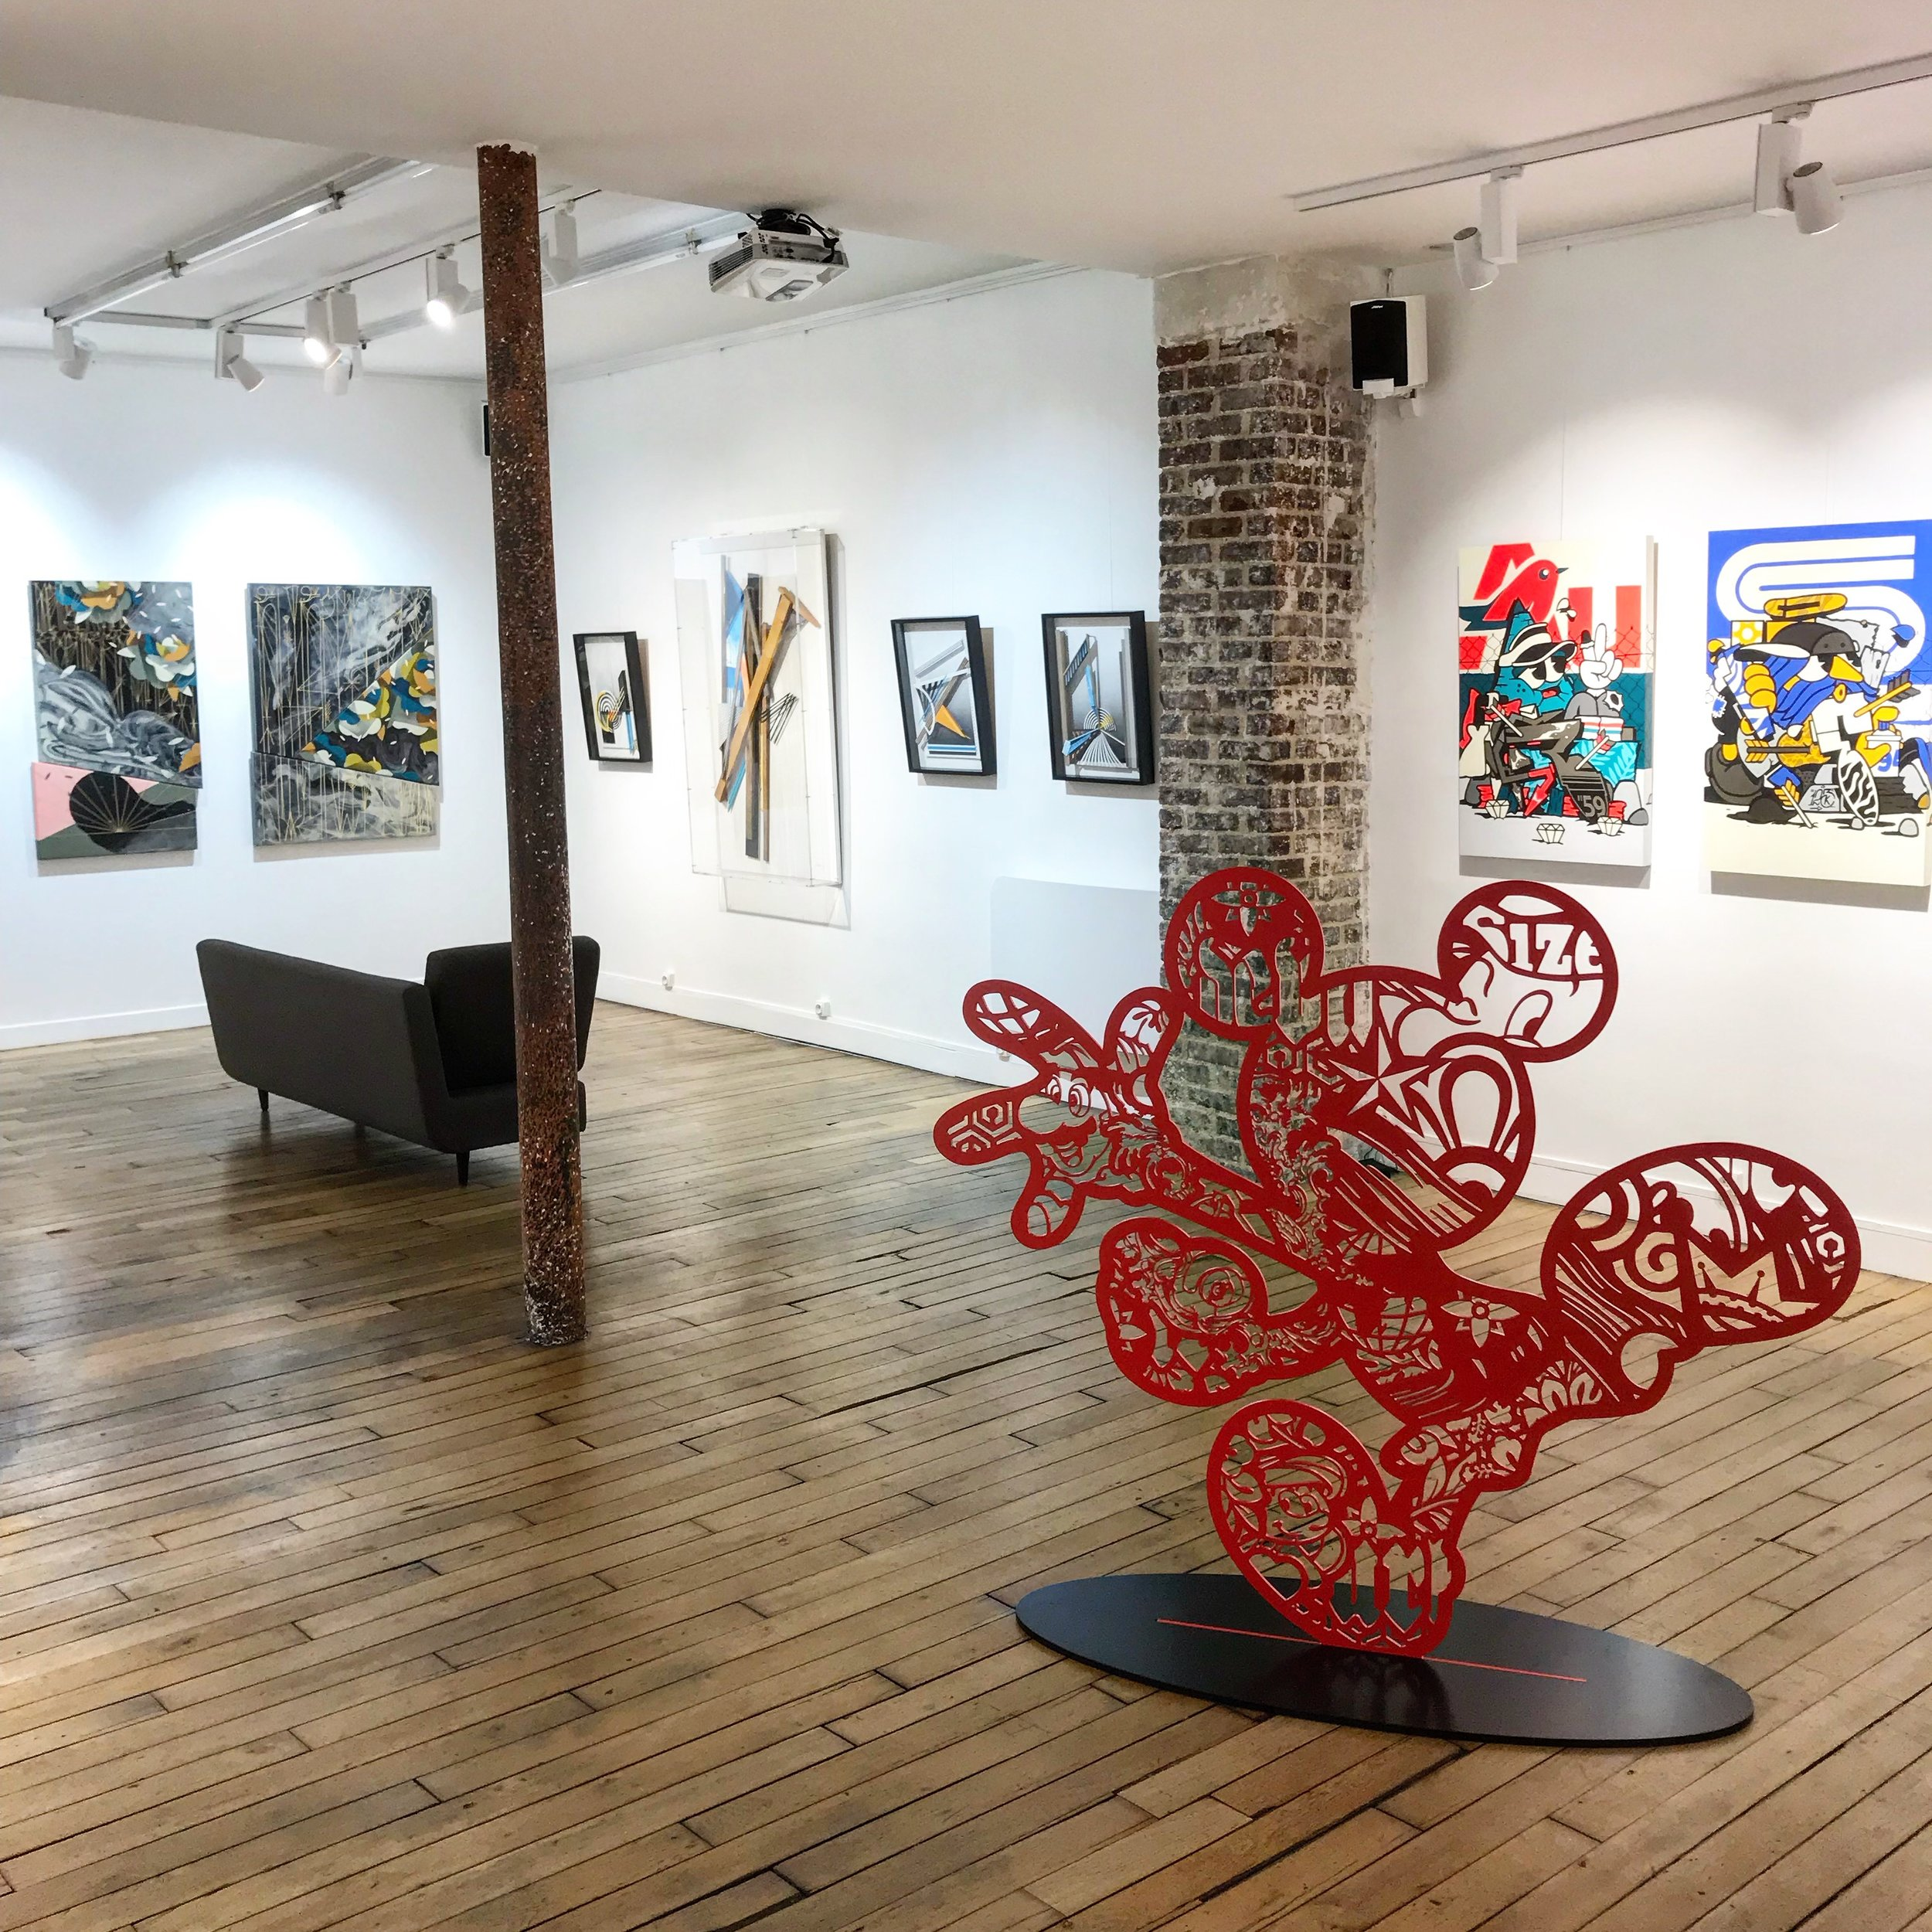 Exposition - Kolly & Happy Gallery